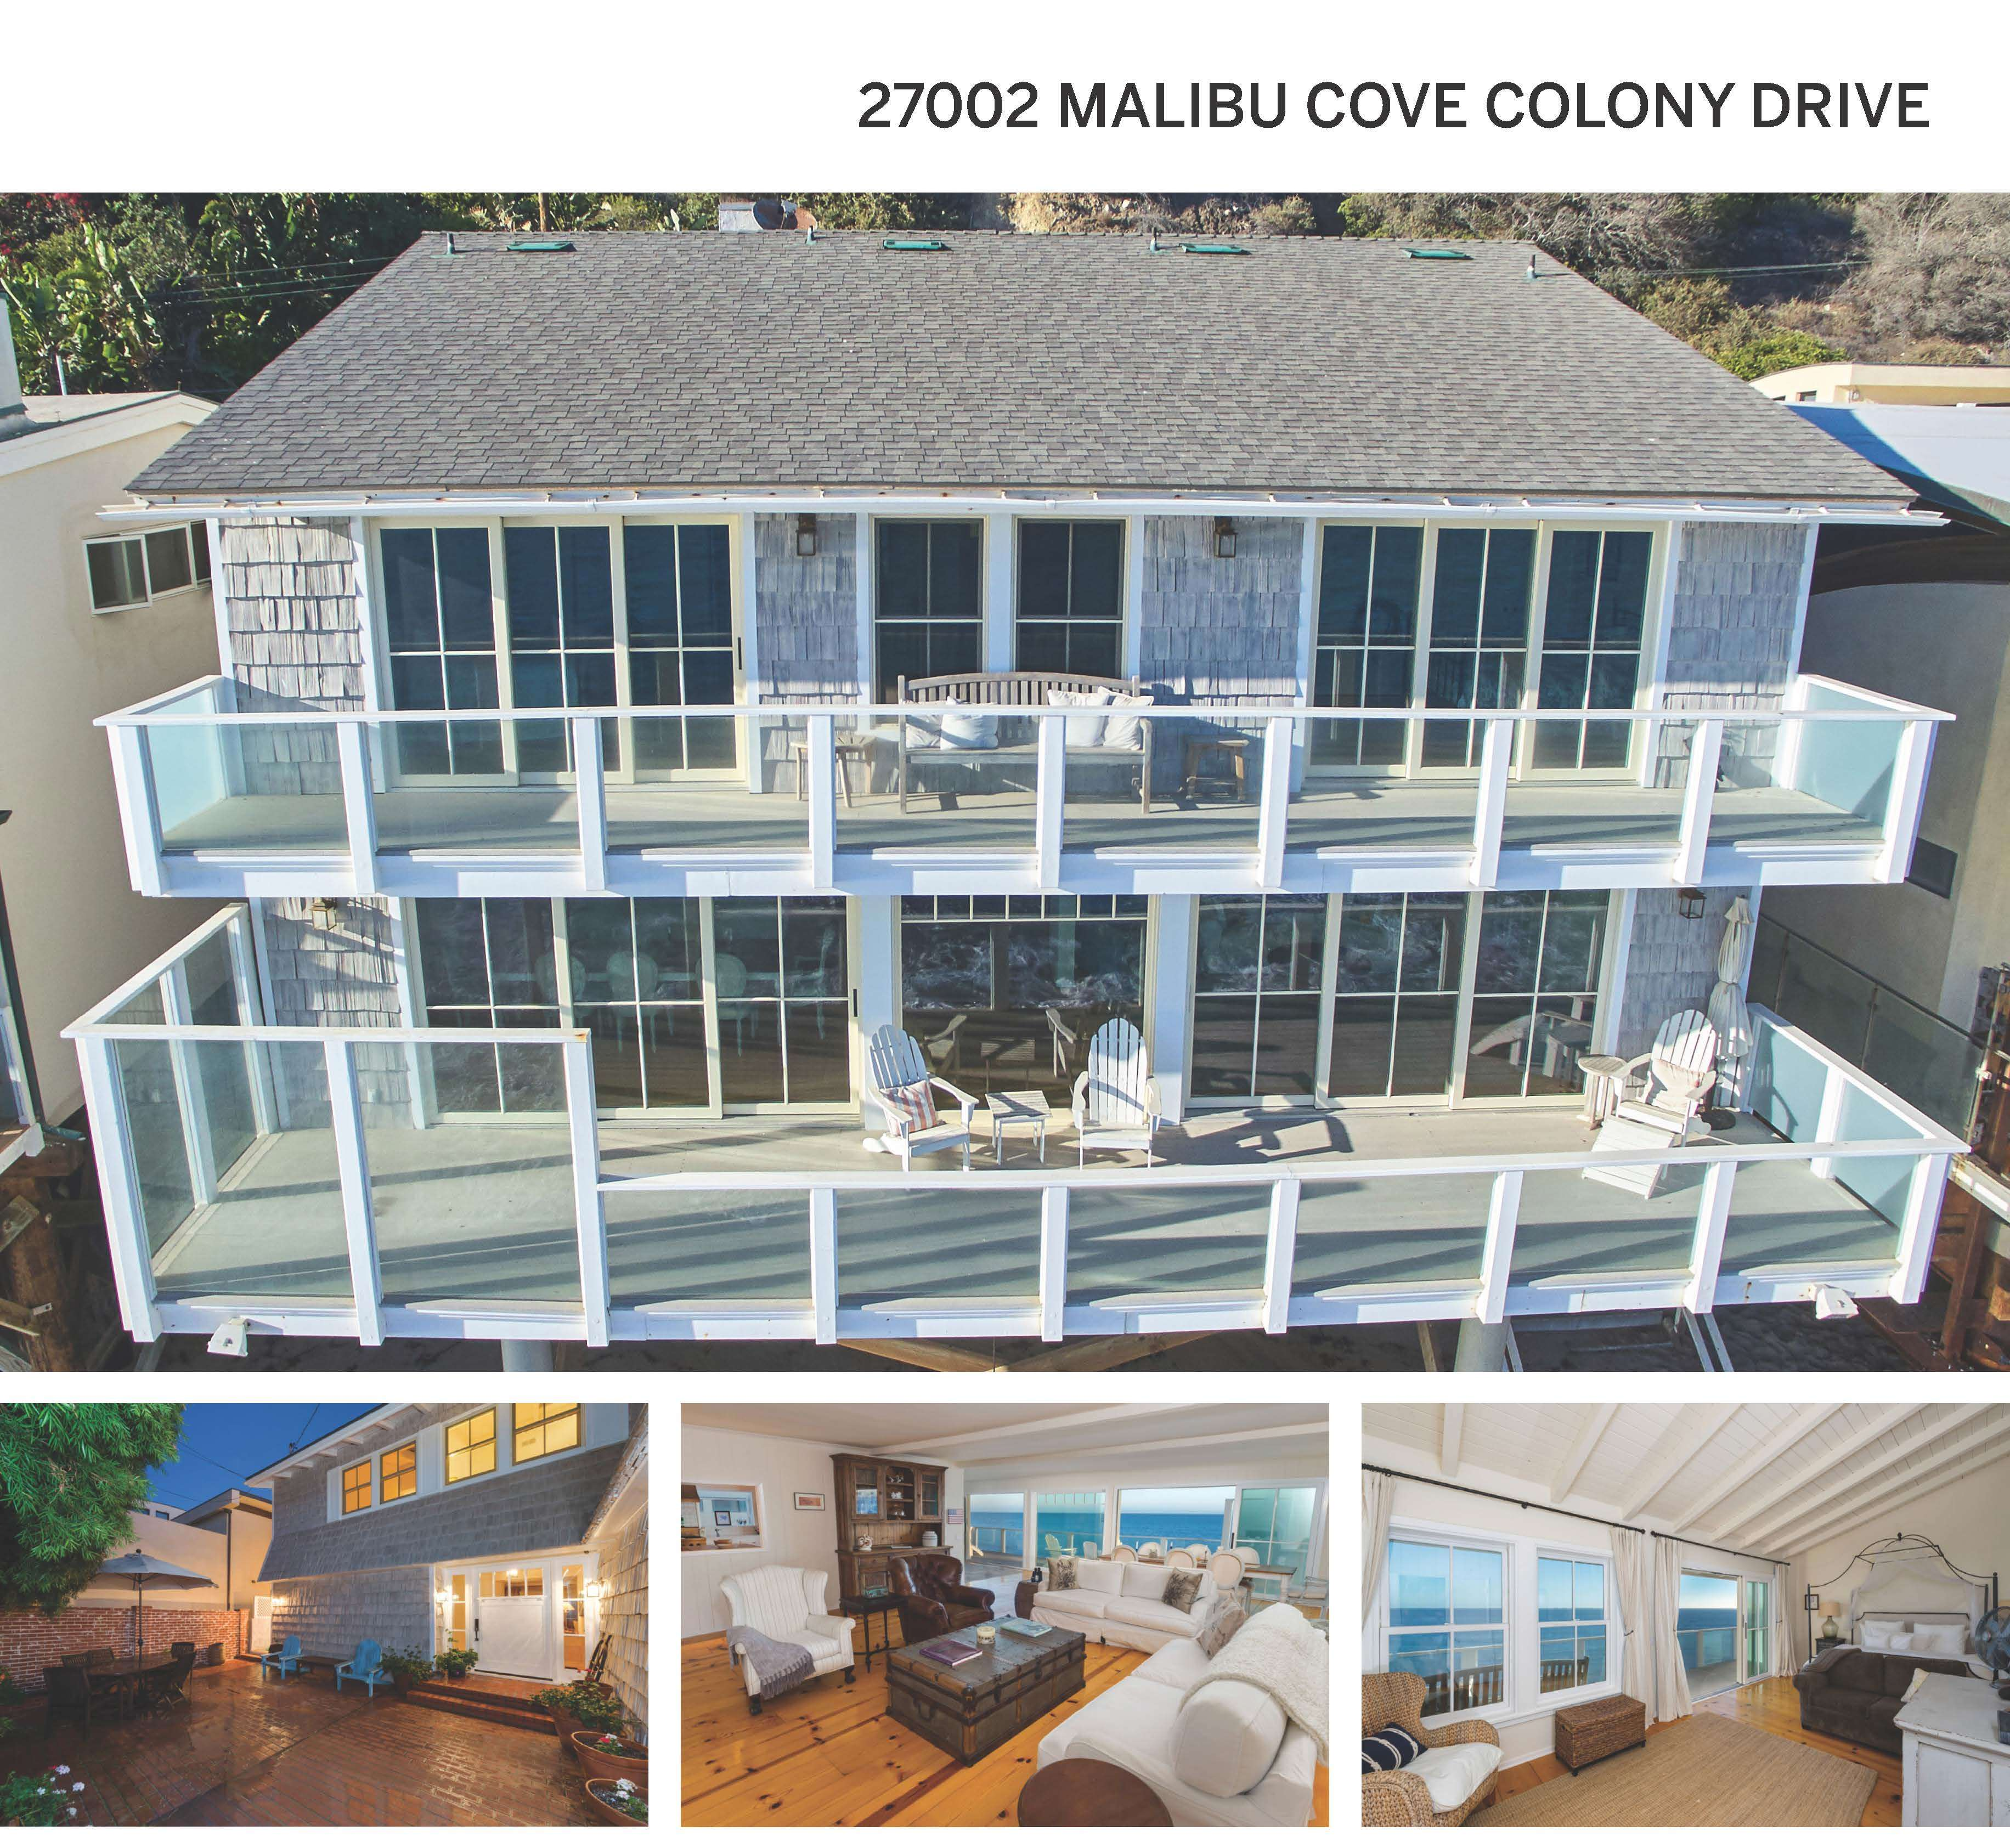 NEW: Malibu 3000 sqft+ In Guard Gated Community